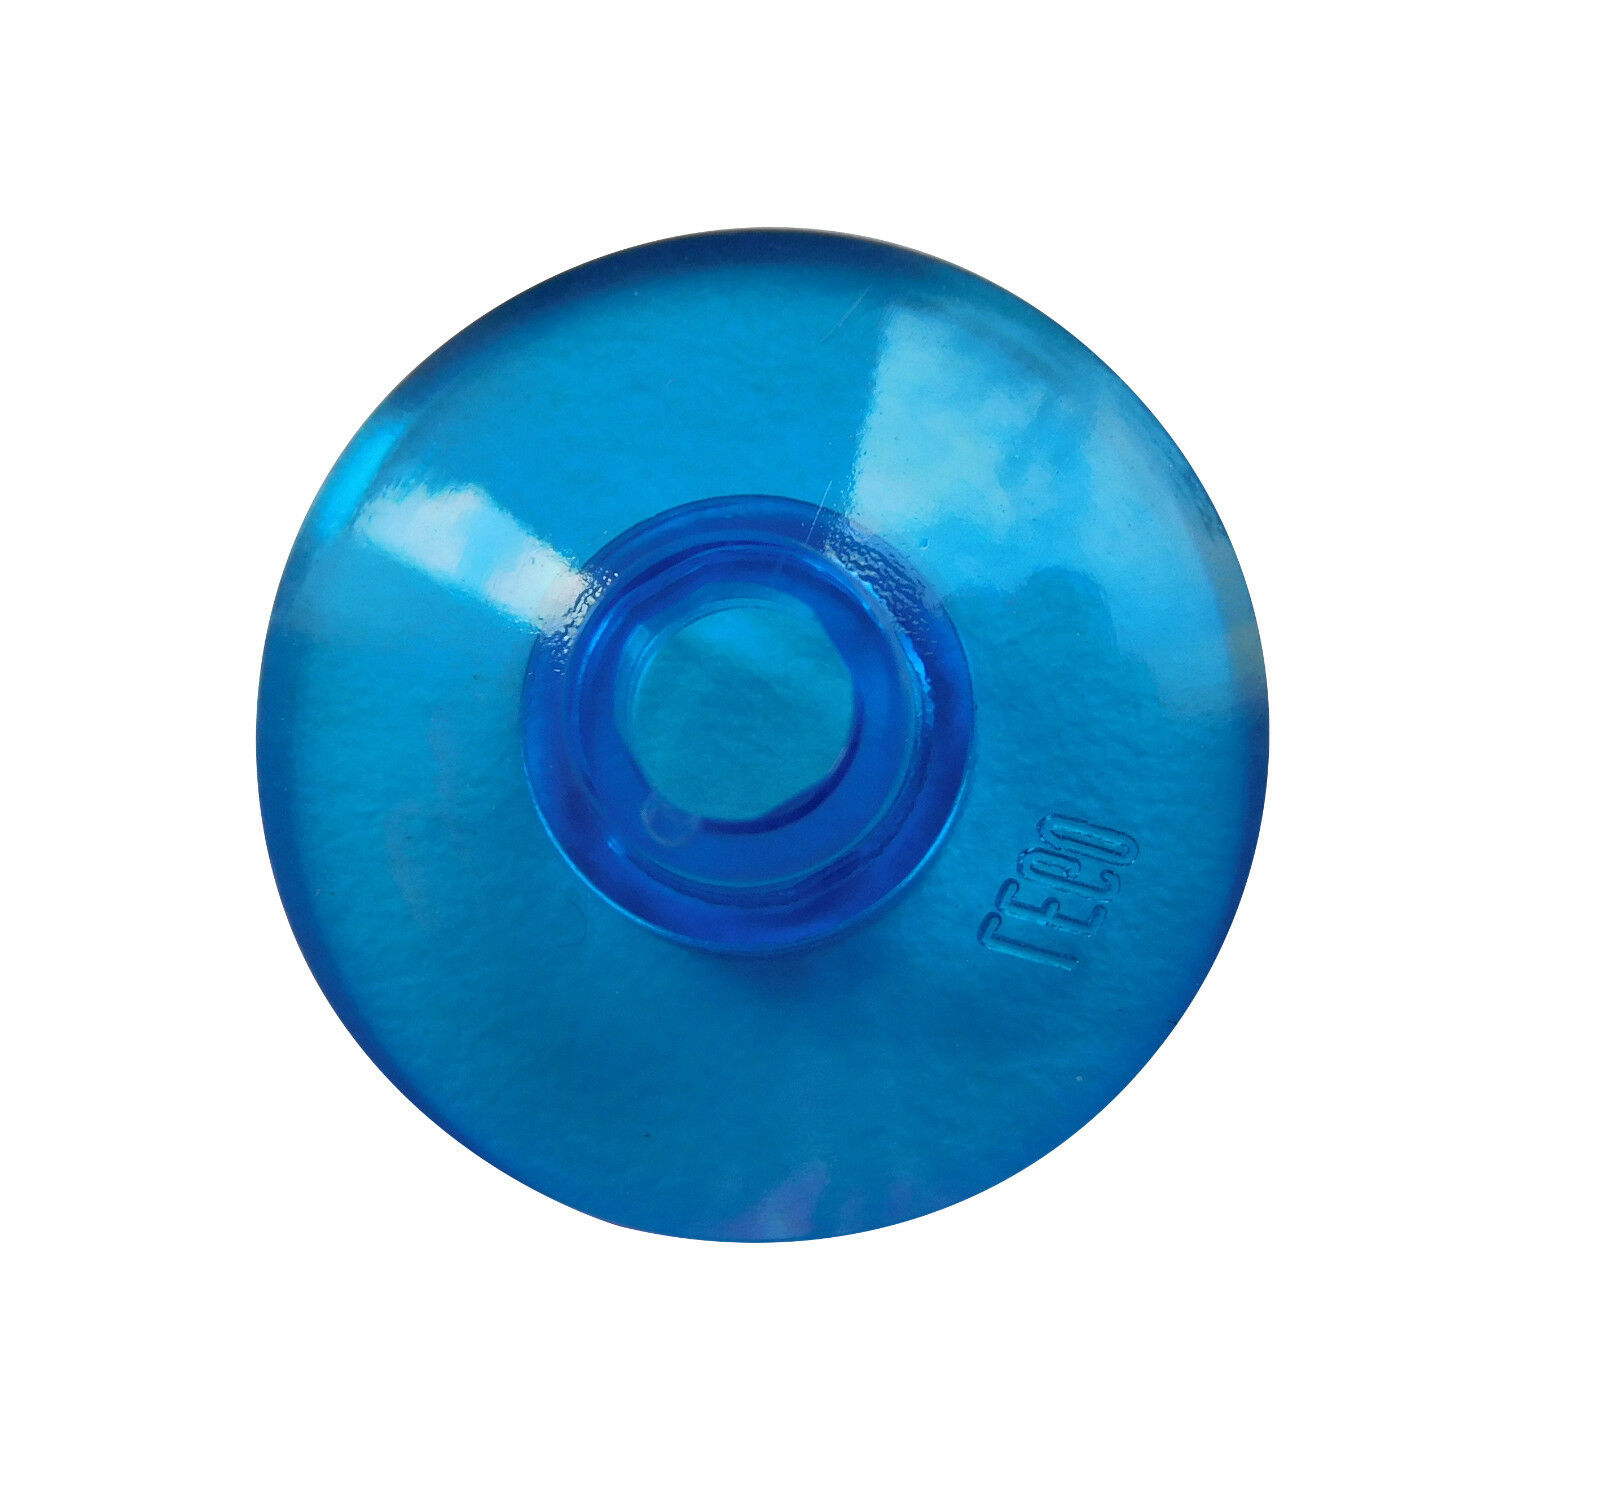 LEGO 2 X 2 Trans Dark Blue Radar Dish Lot of 4